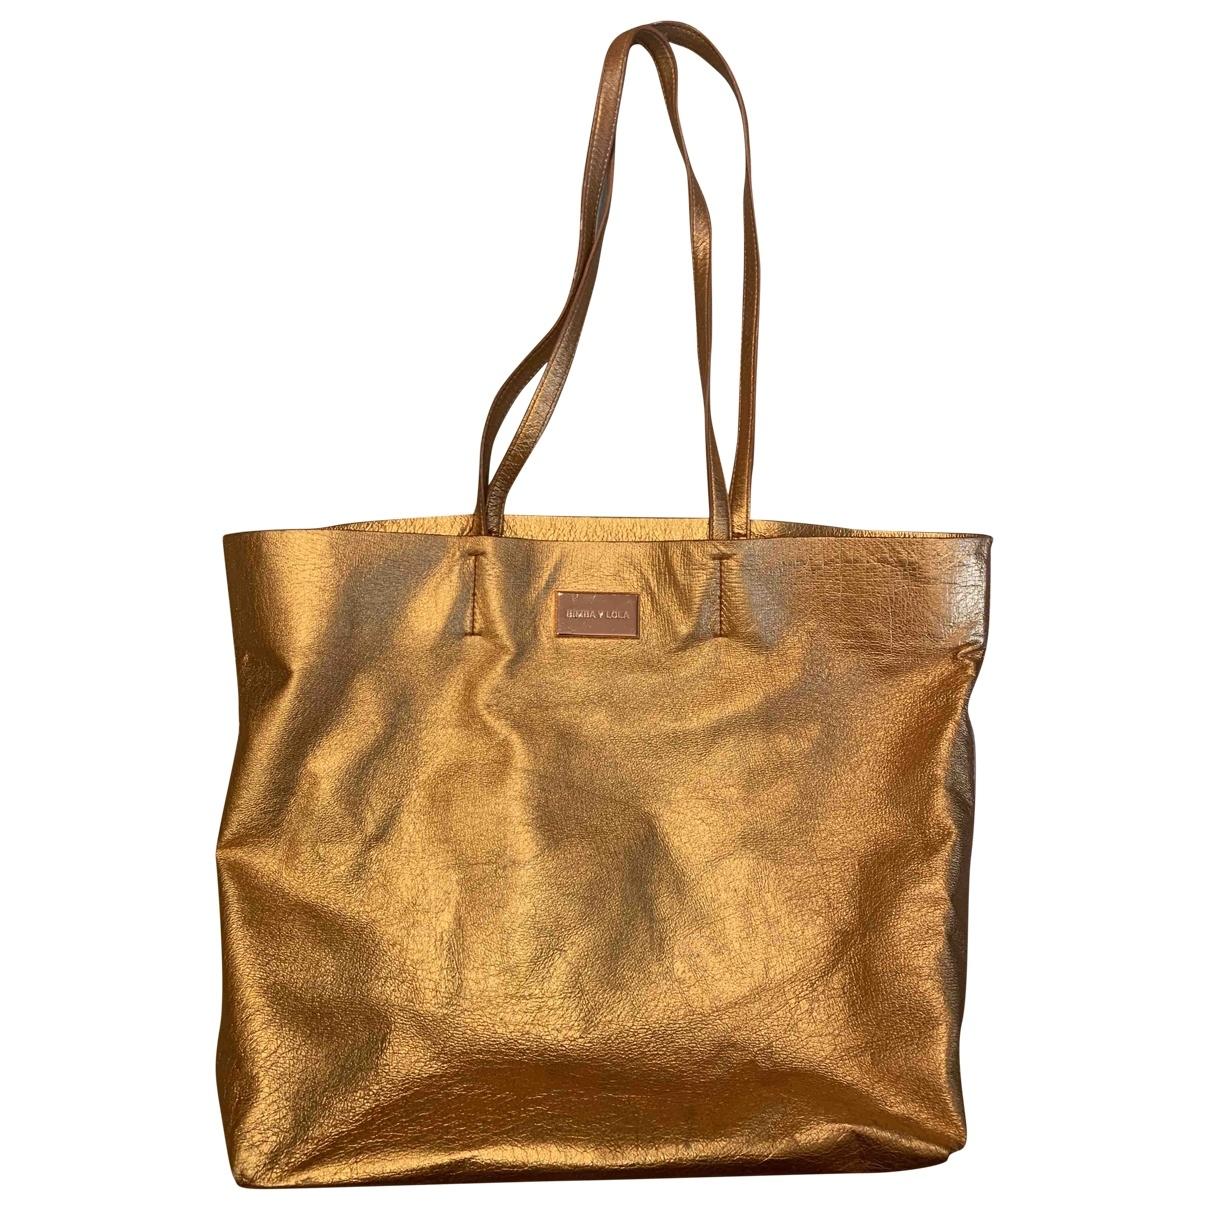 Bimba Y Lola - Sac de voyage   pour femme en cuir - metallise